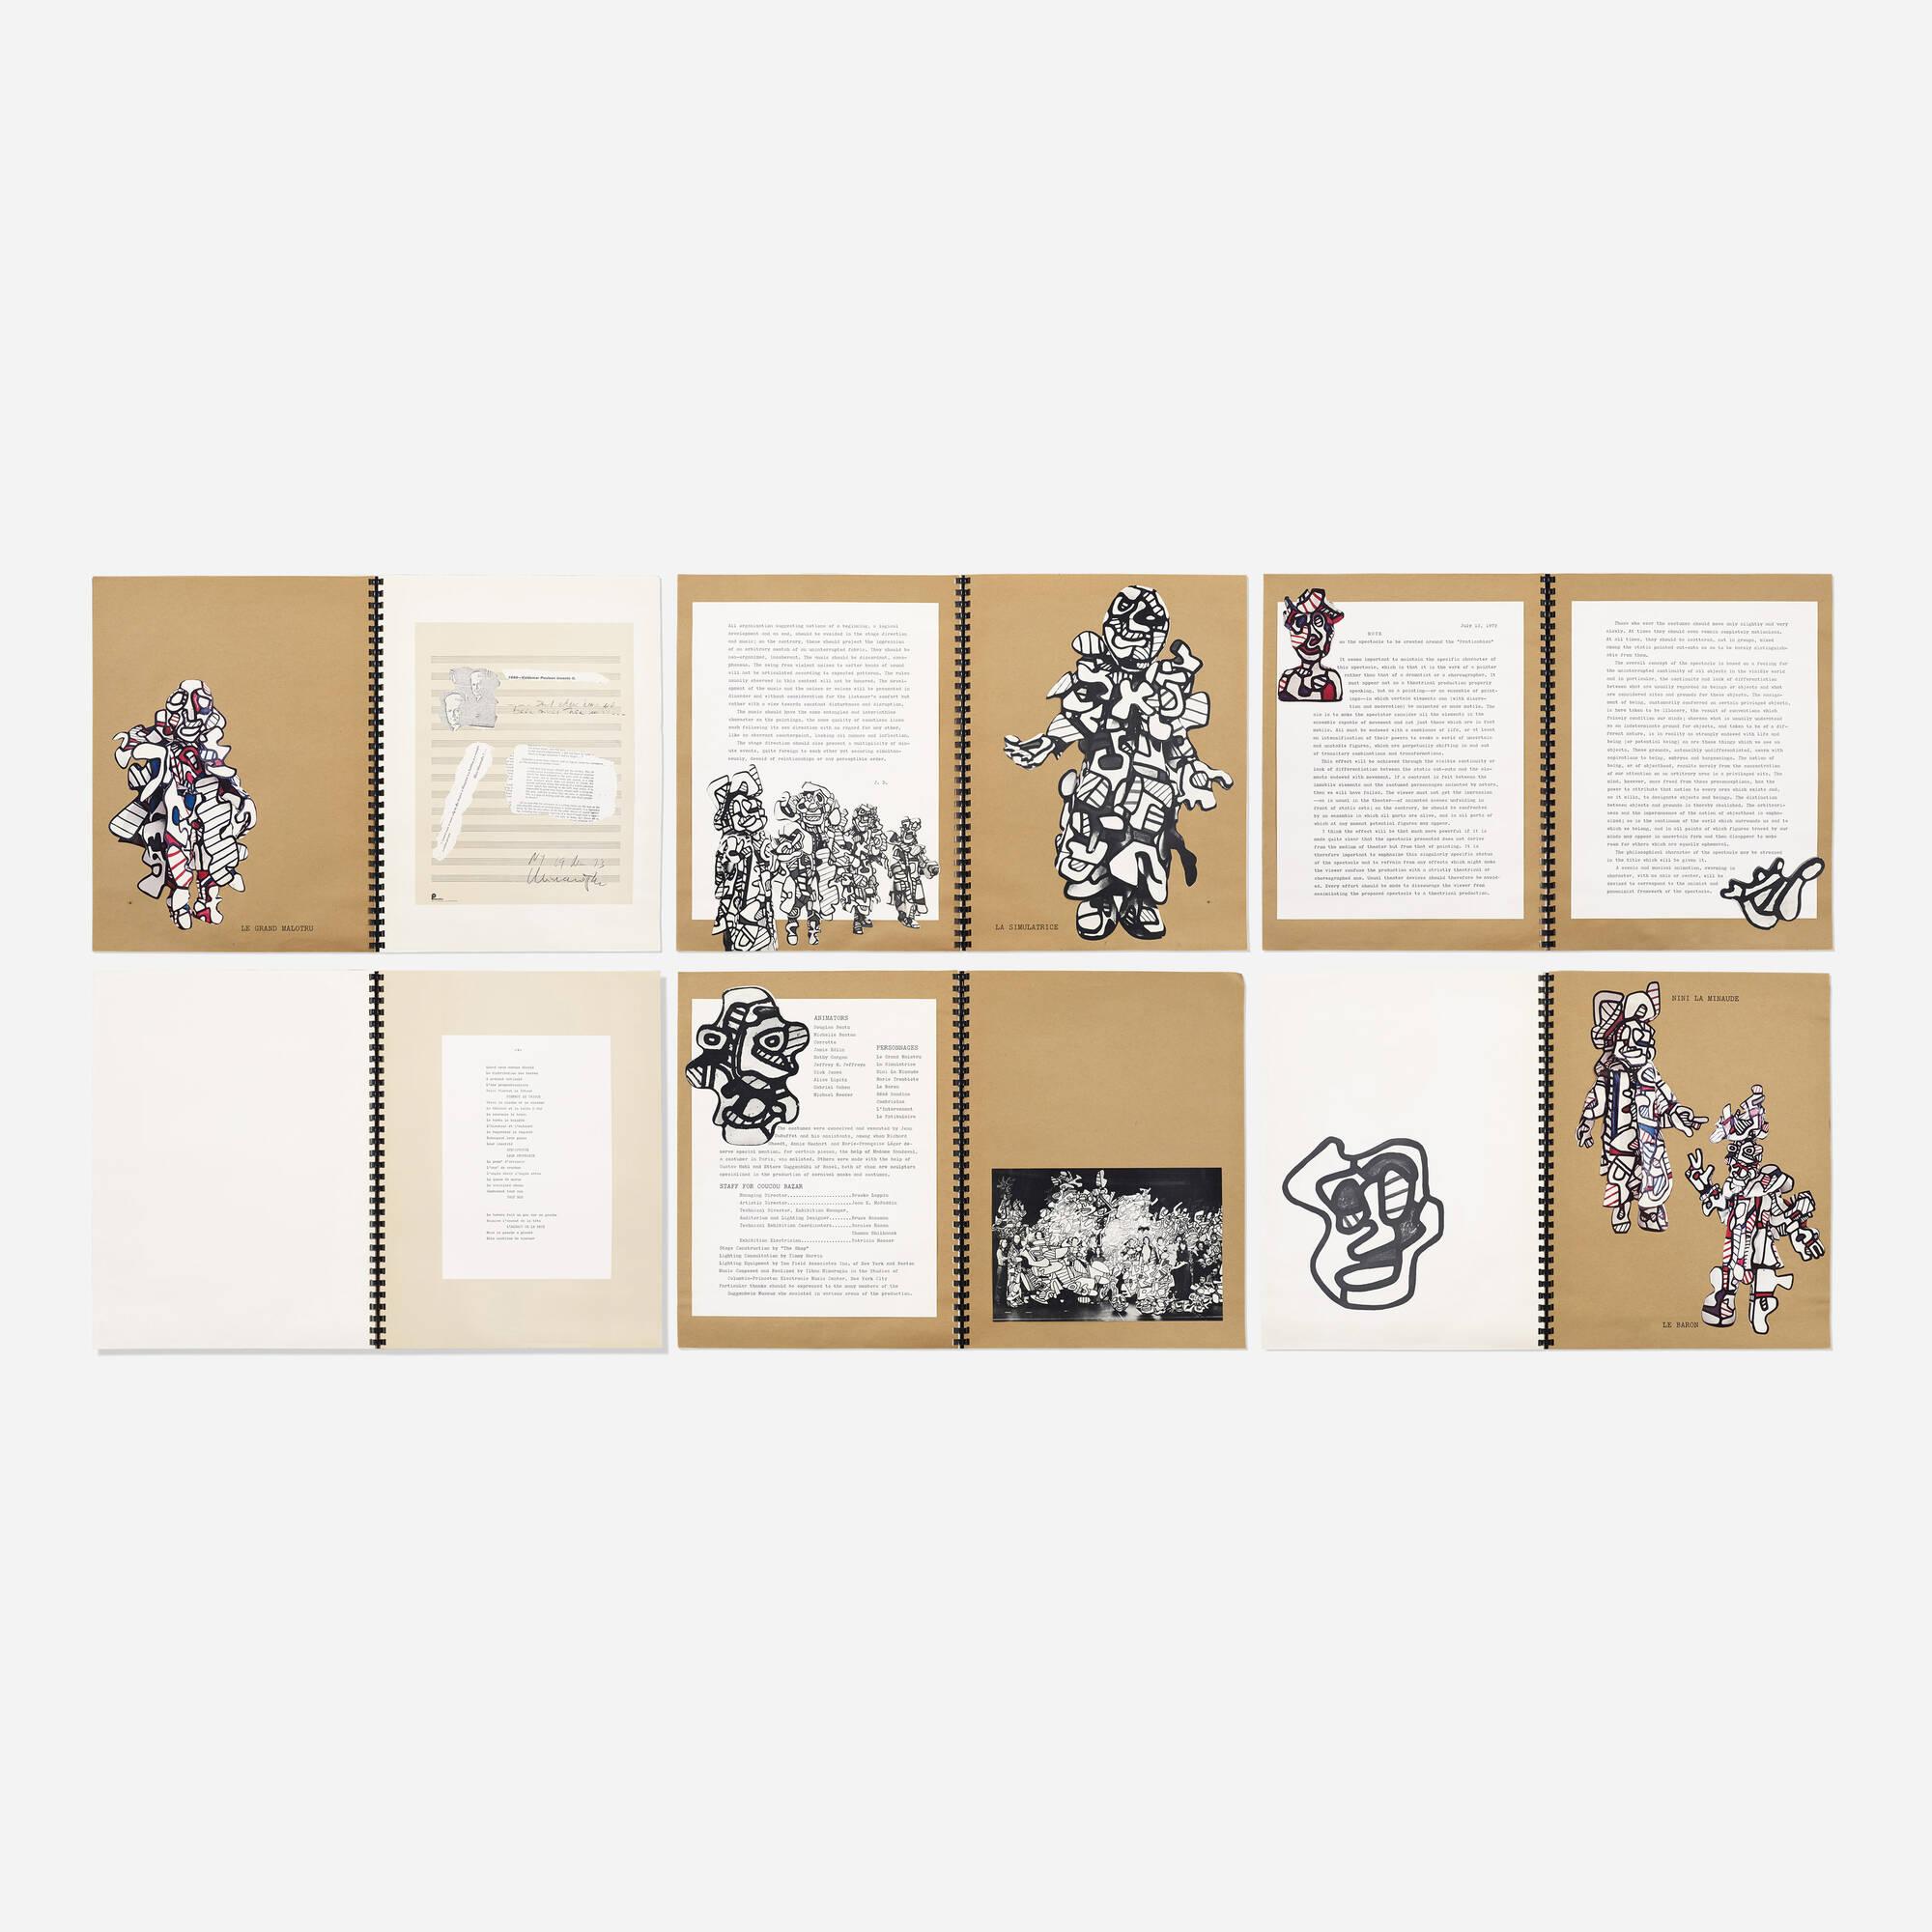 392: Jean Dubuffet / Coucou Bazar program (1 of 2)